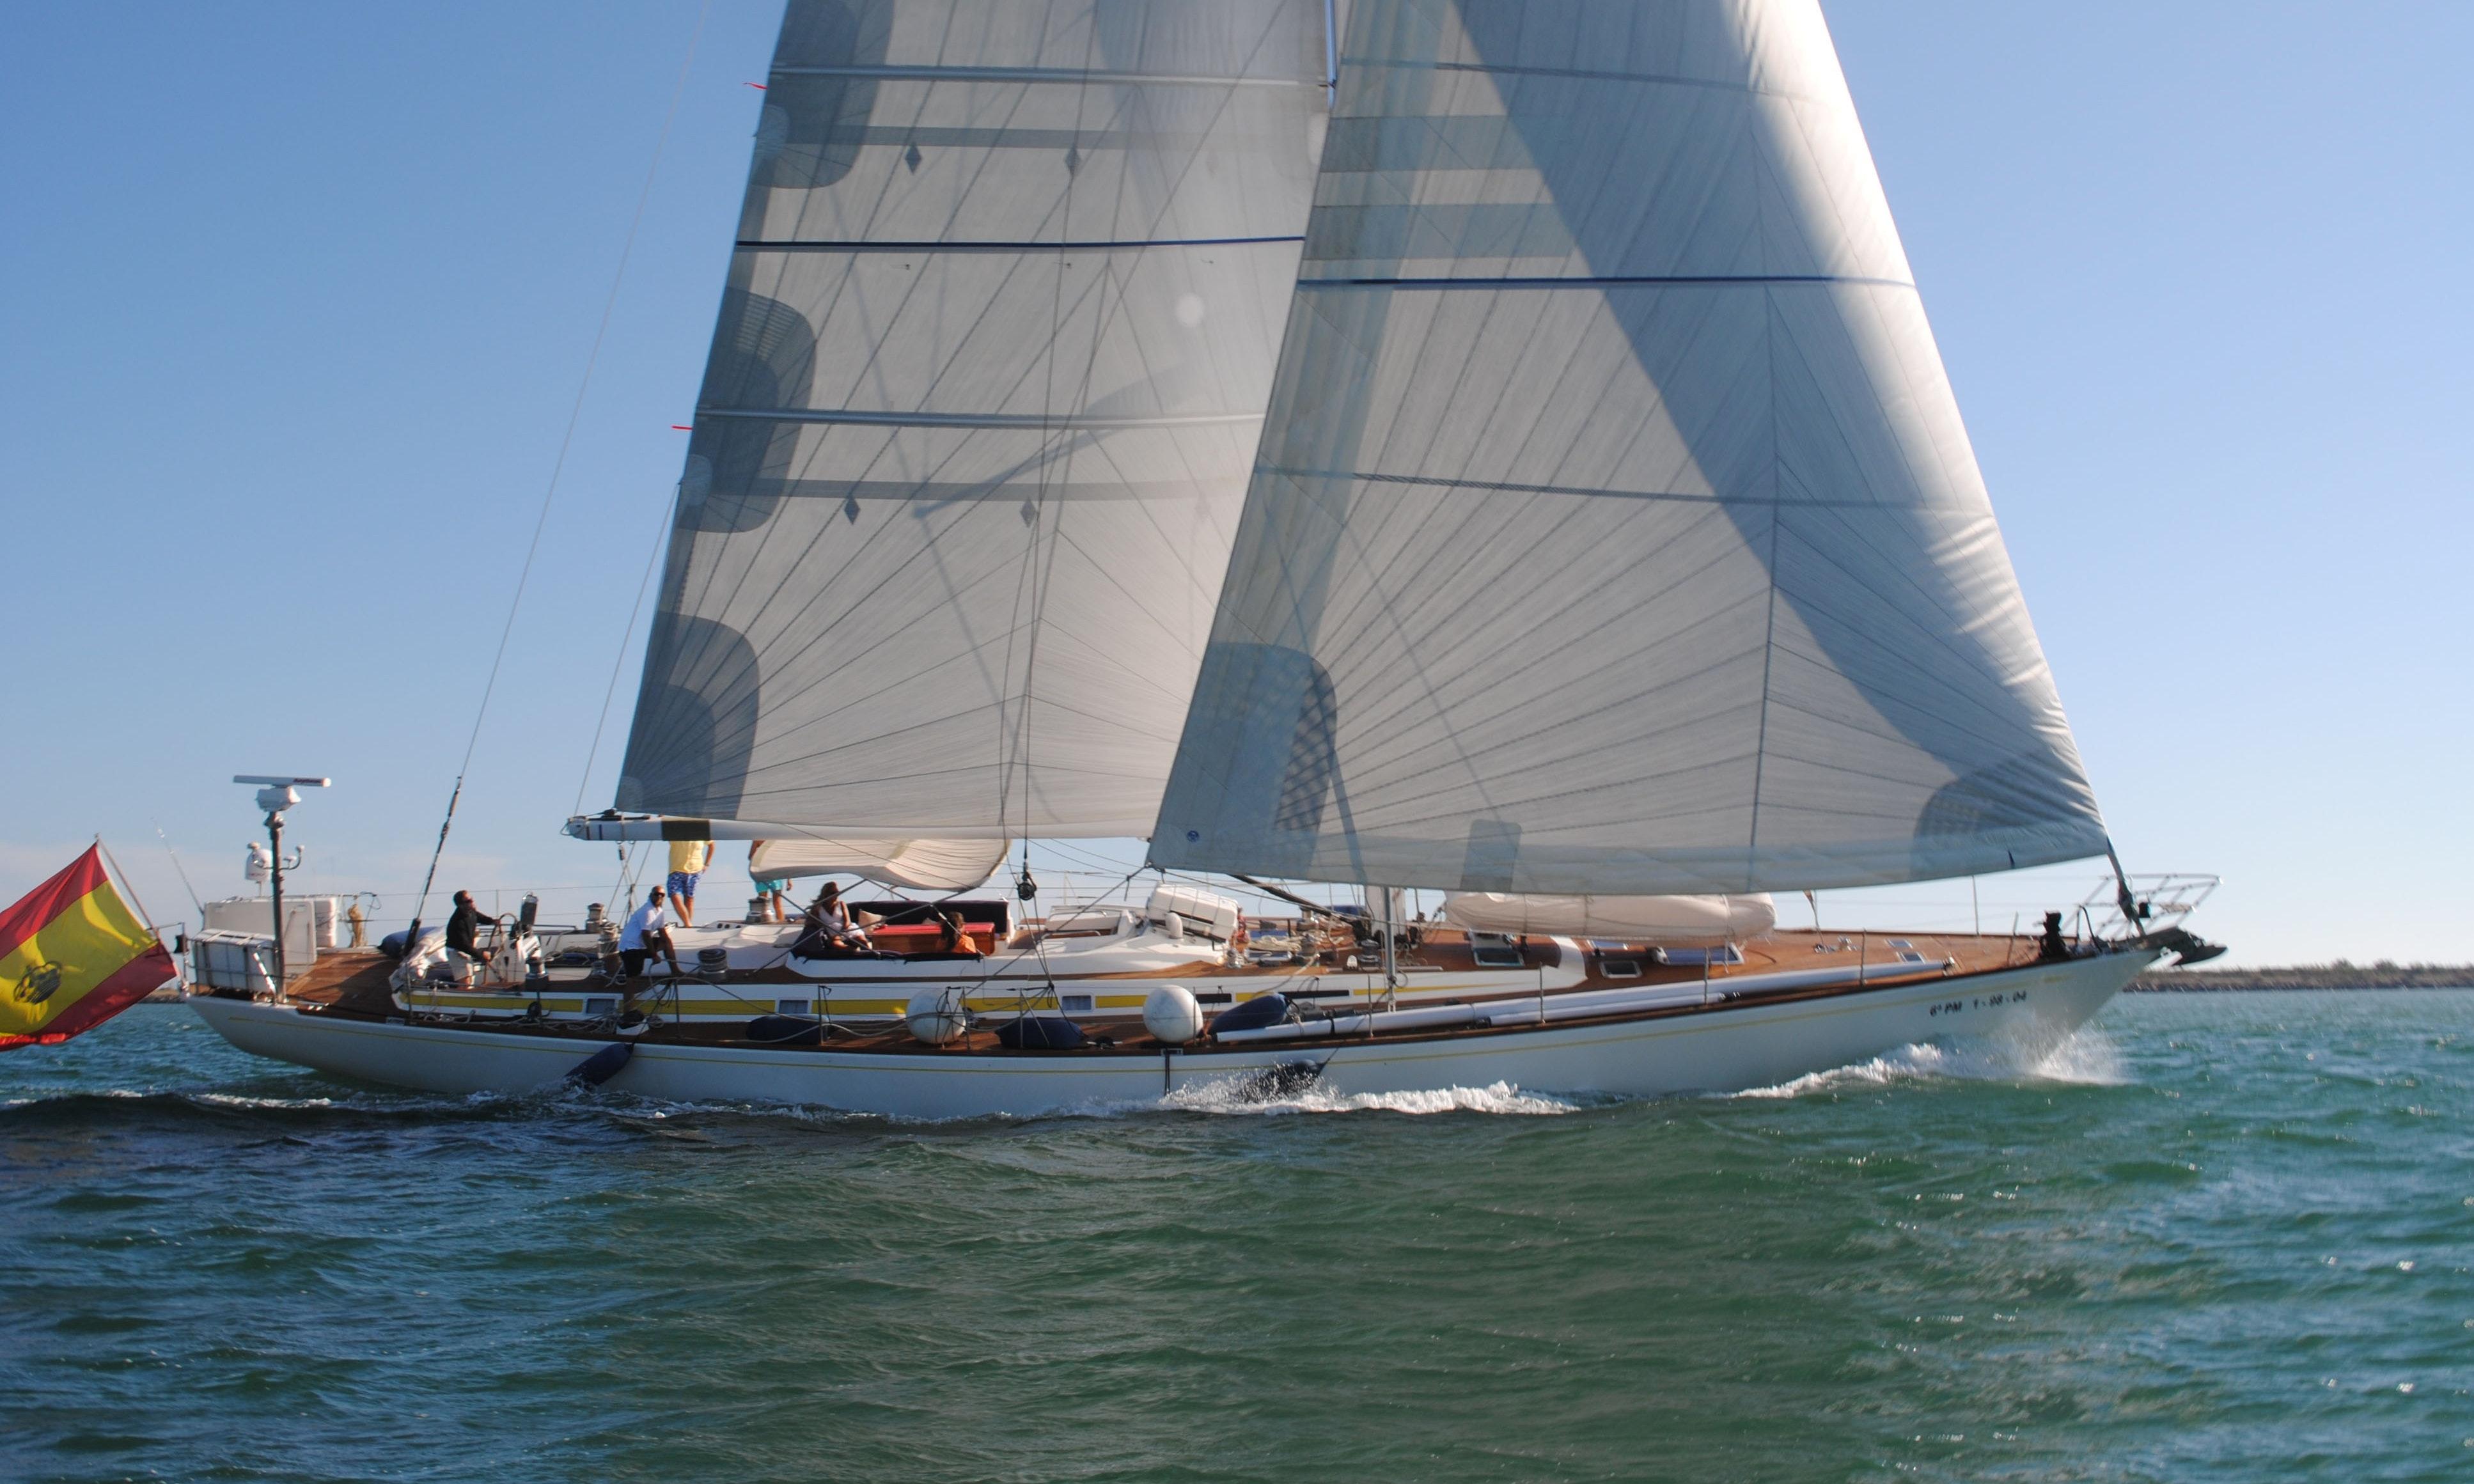 2002 Nautor's Swan 77, Newport Rhode Island - boats.com